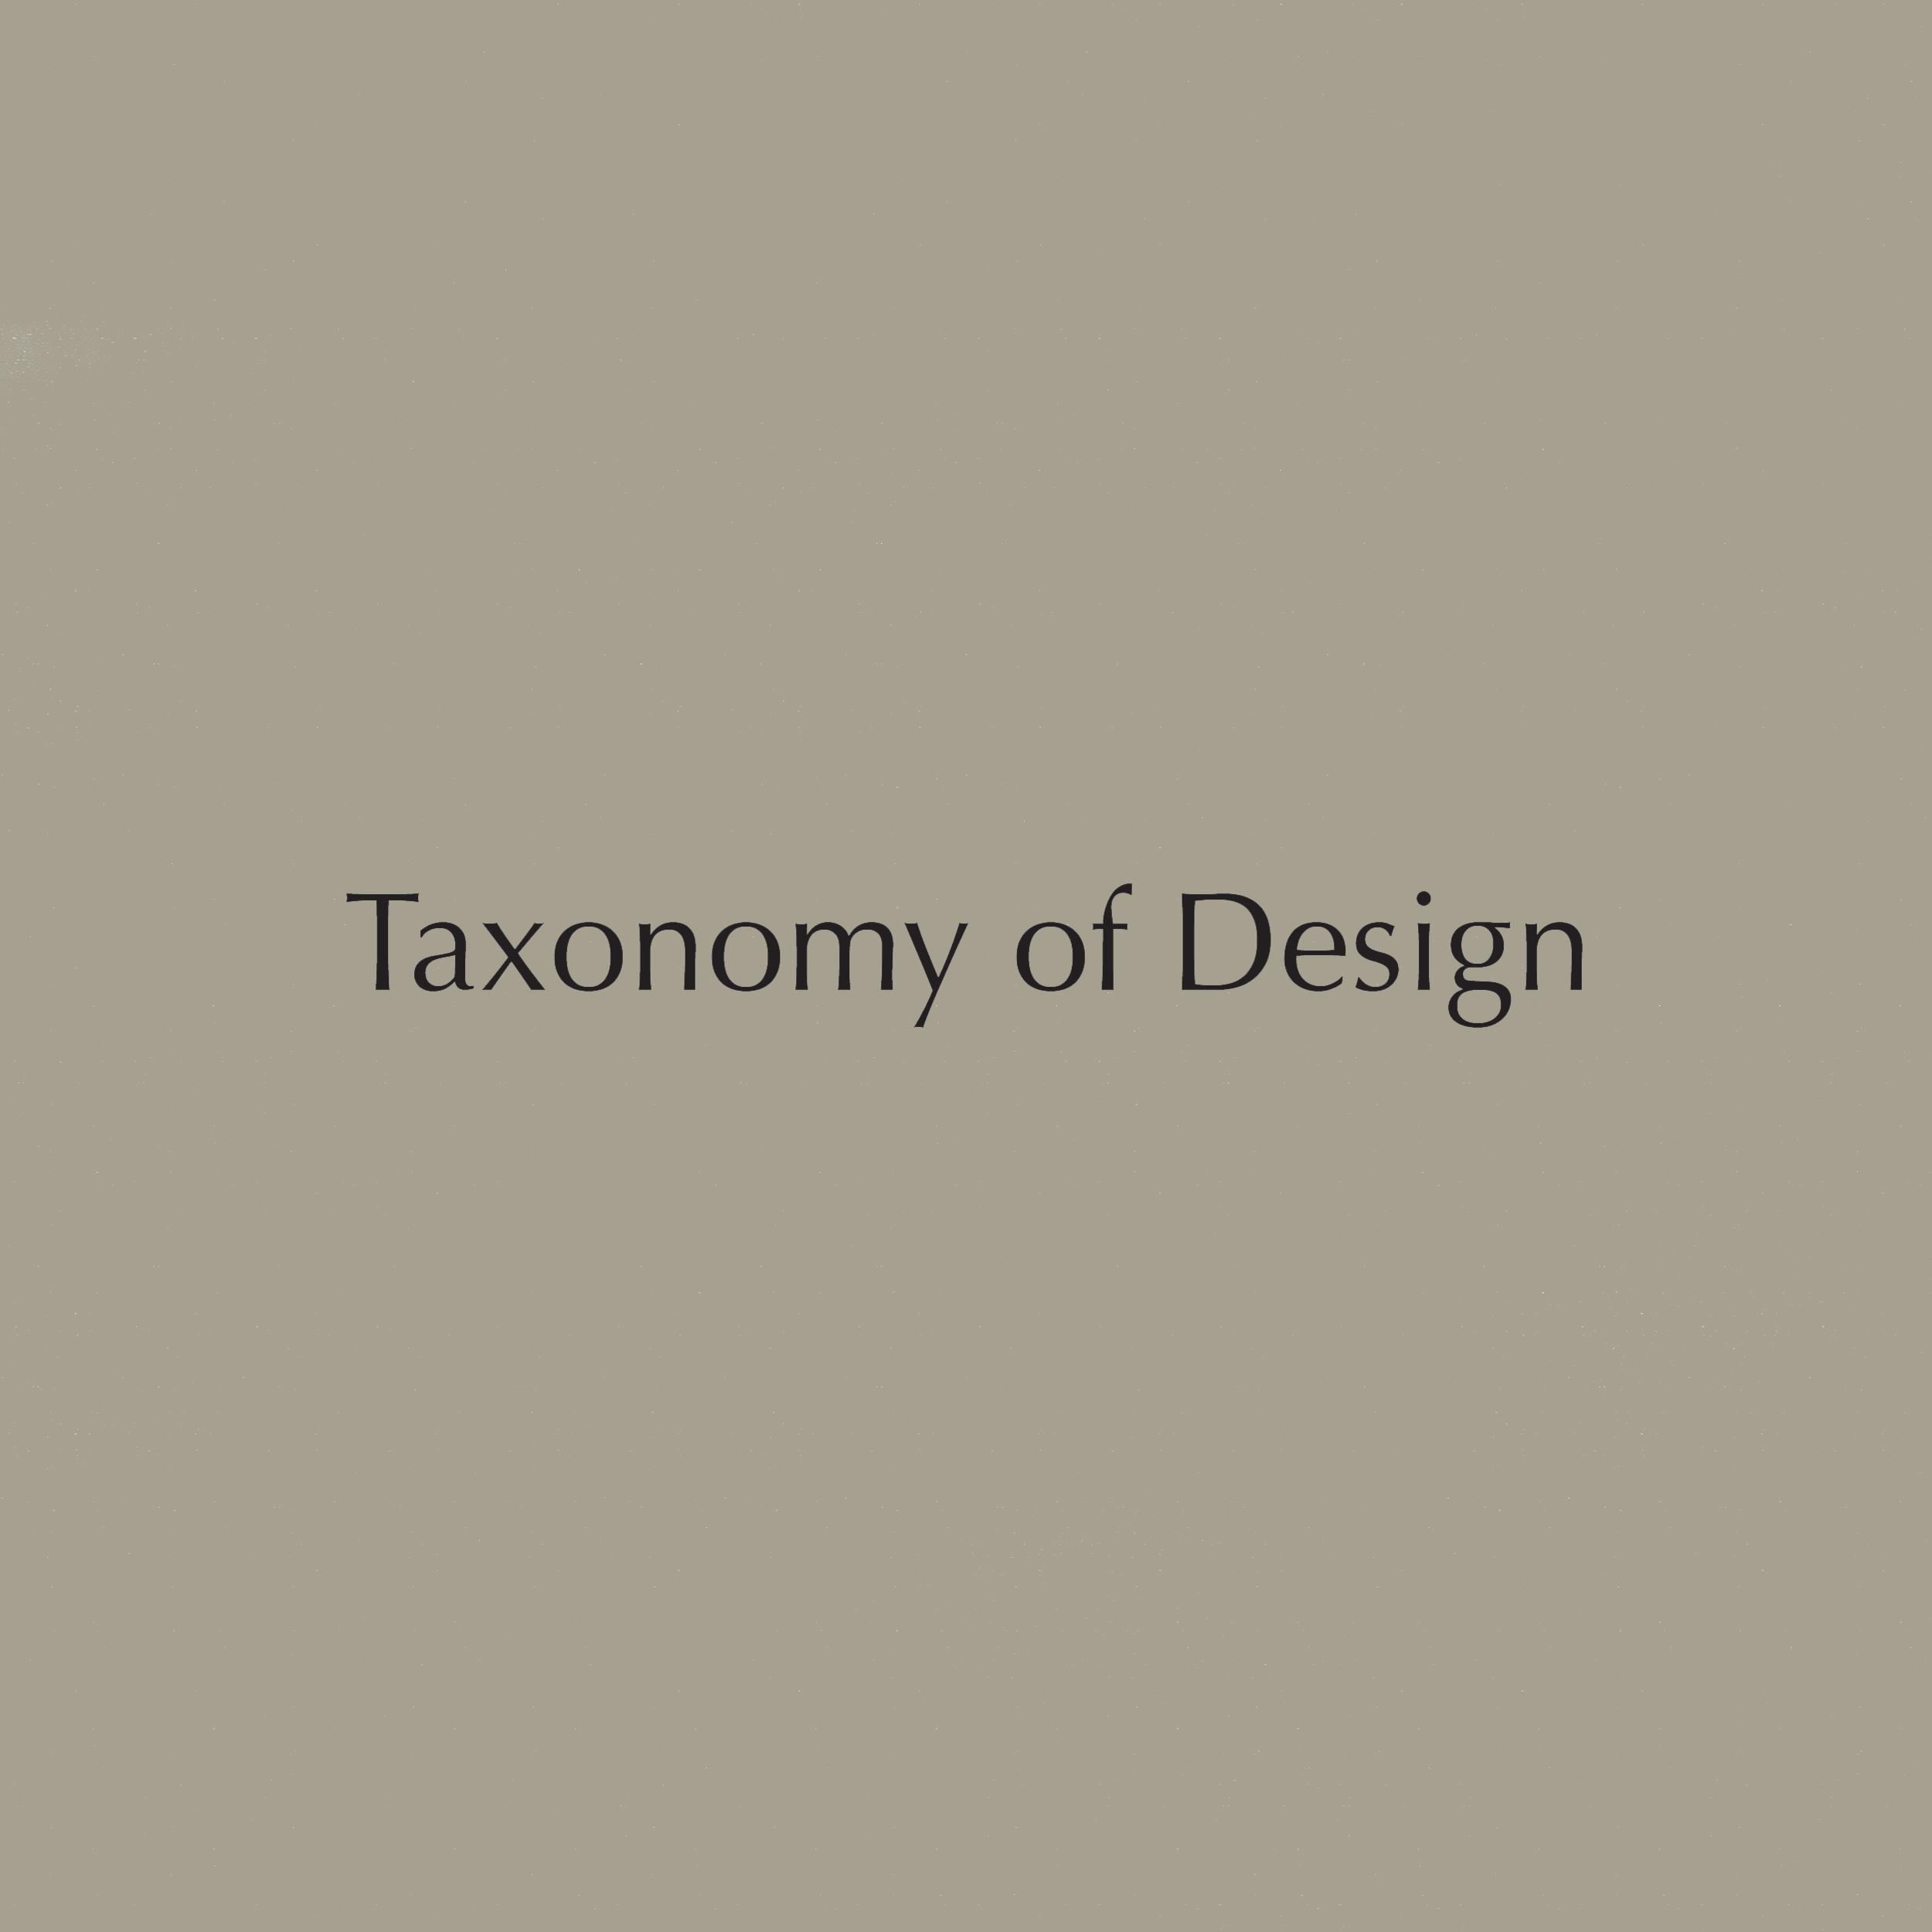 TaxonomyofDesign-PNG.png